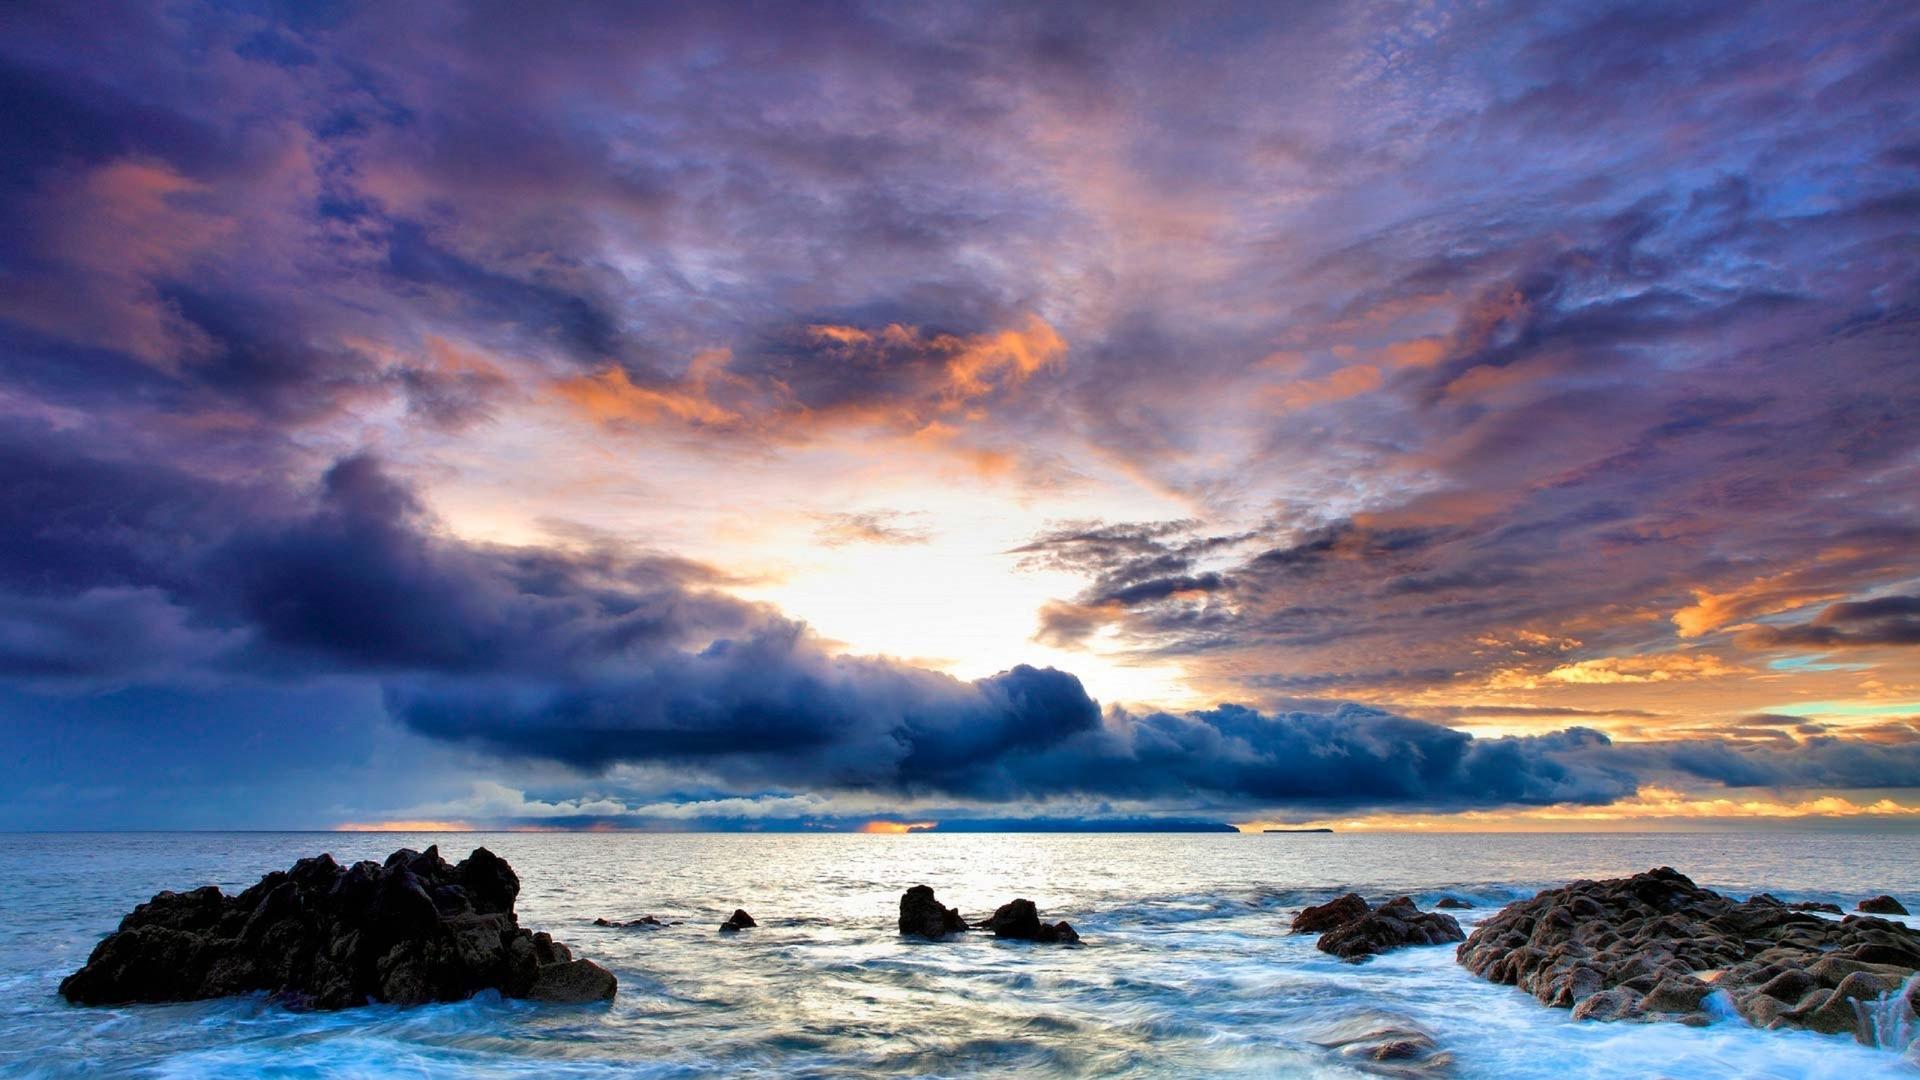 Пейзаж моря картинка